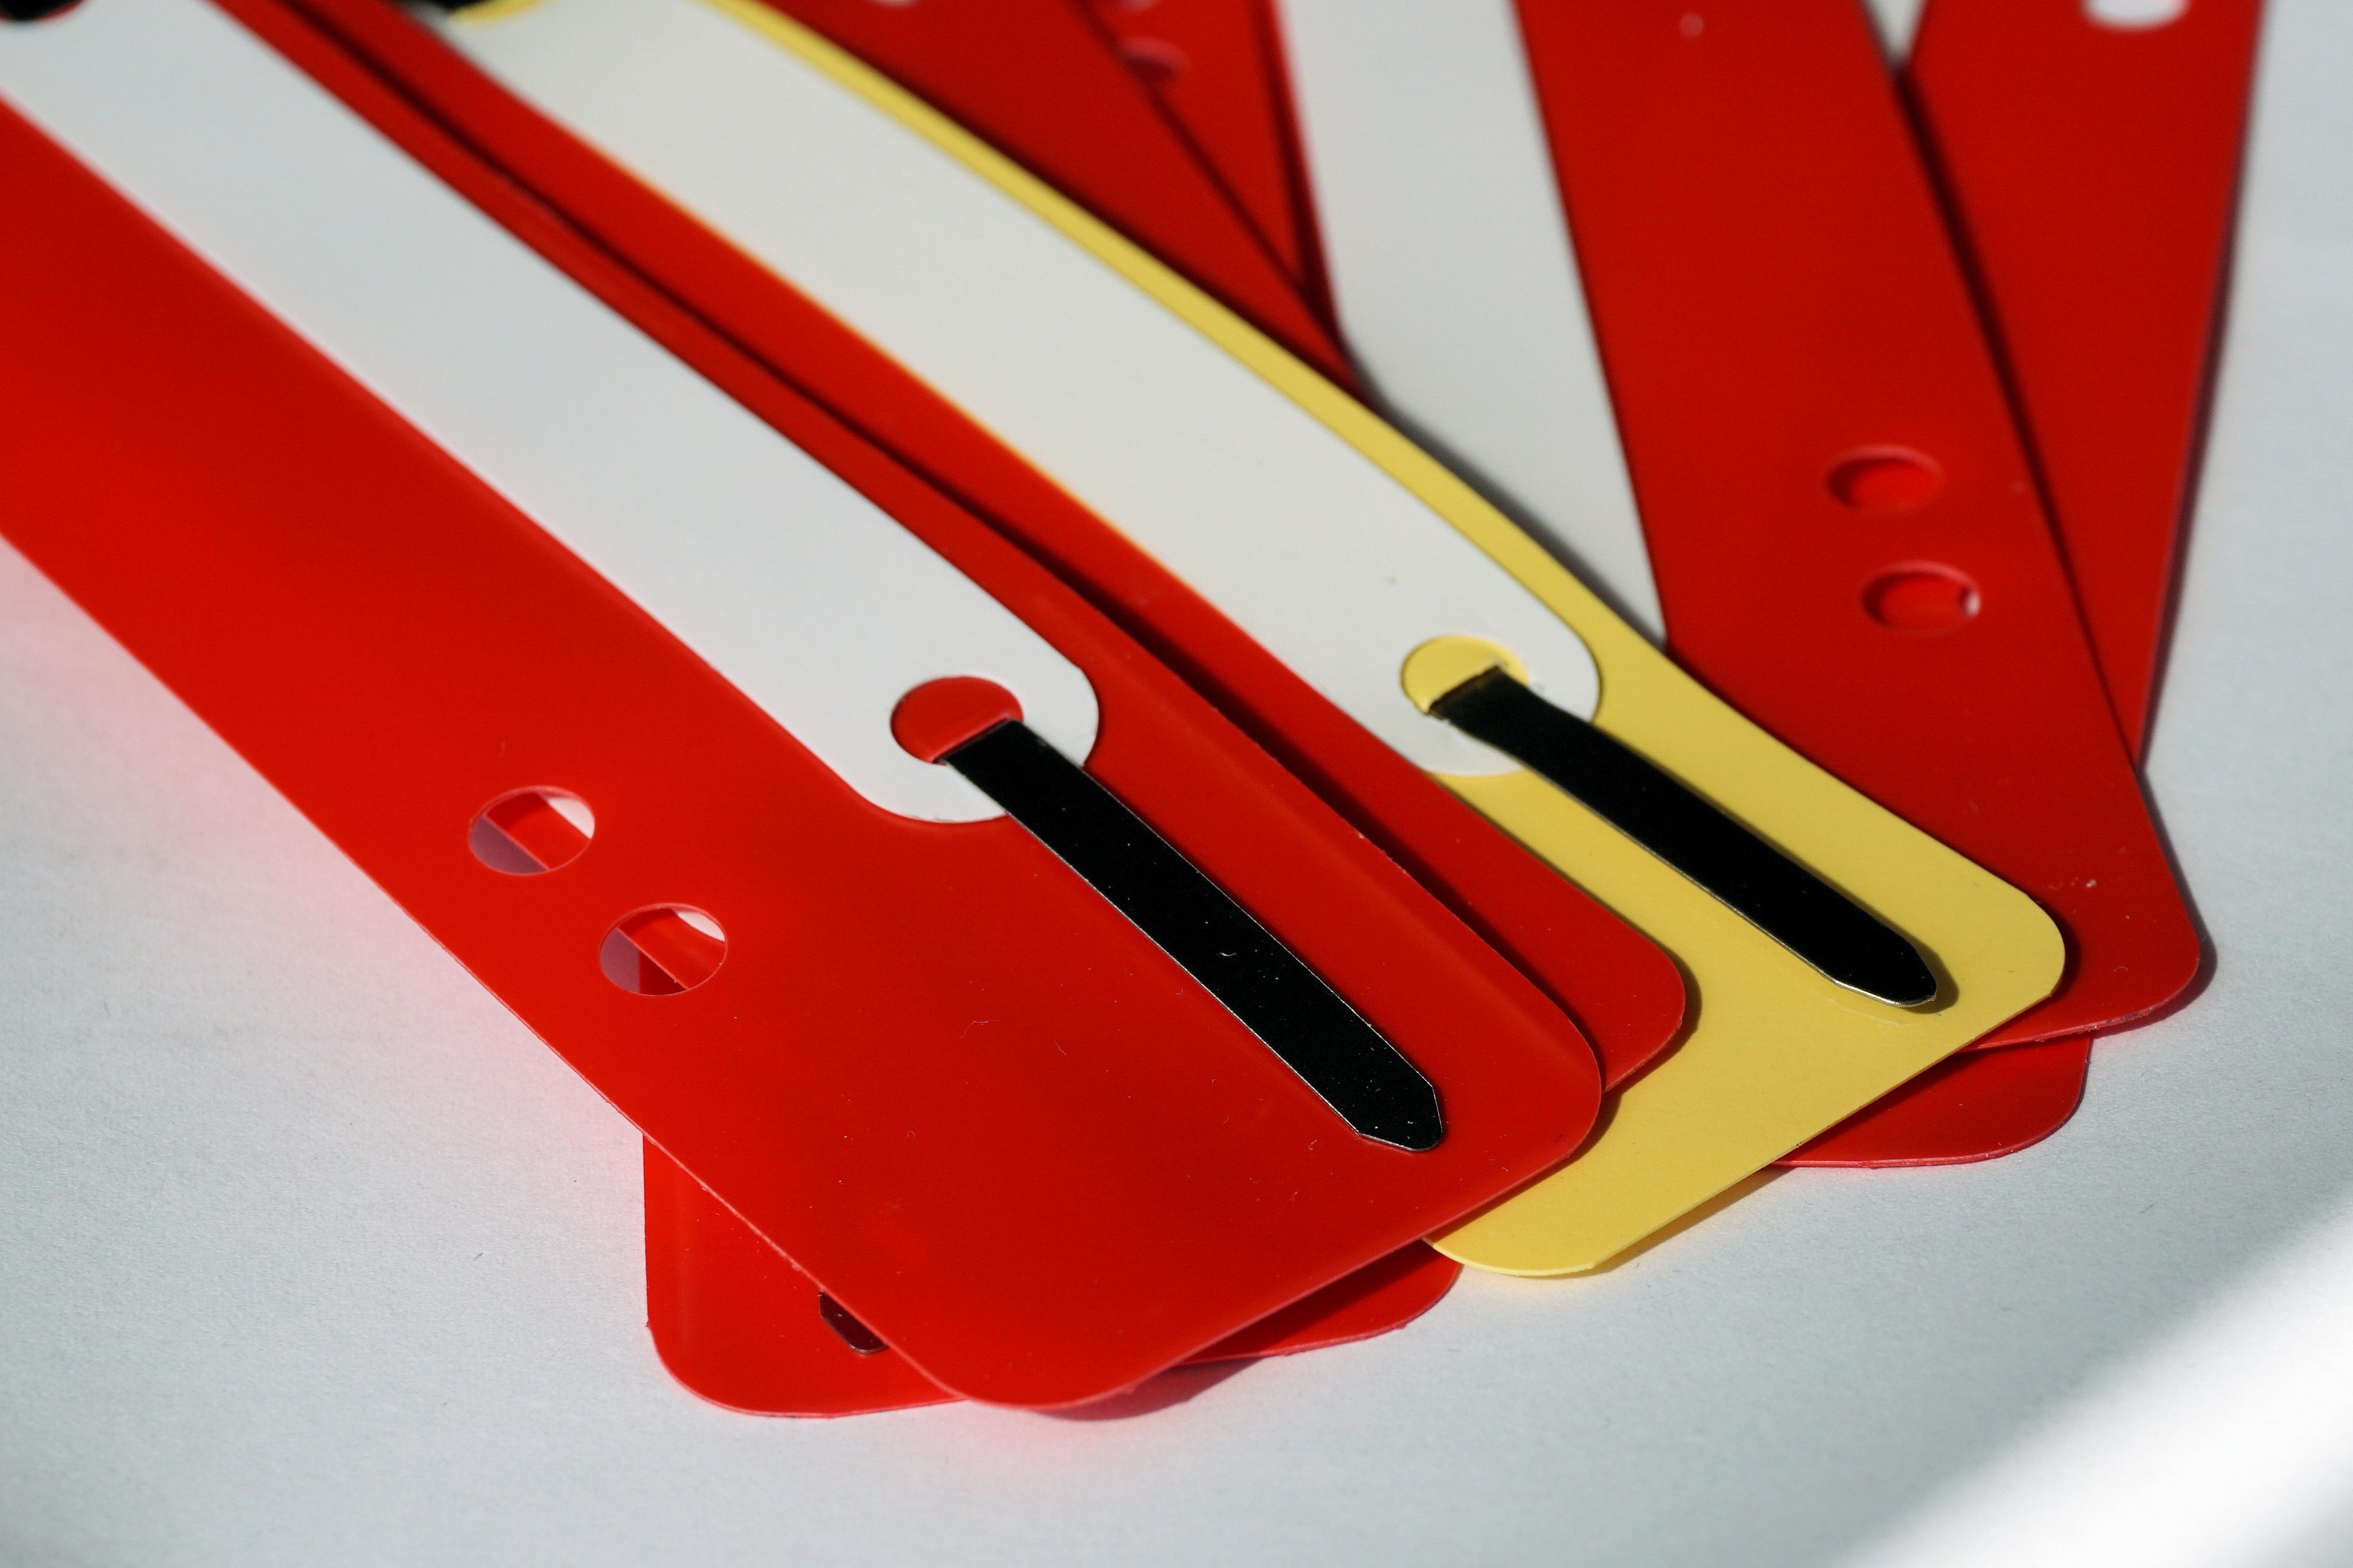 Arbeit Fallen Nummer Rot Farbe Büro Stapel Papier  Schriftart Illustration  Machen Dateien Binden Heften Verordnung